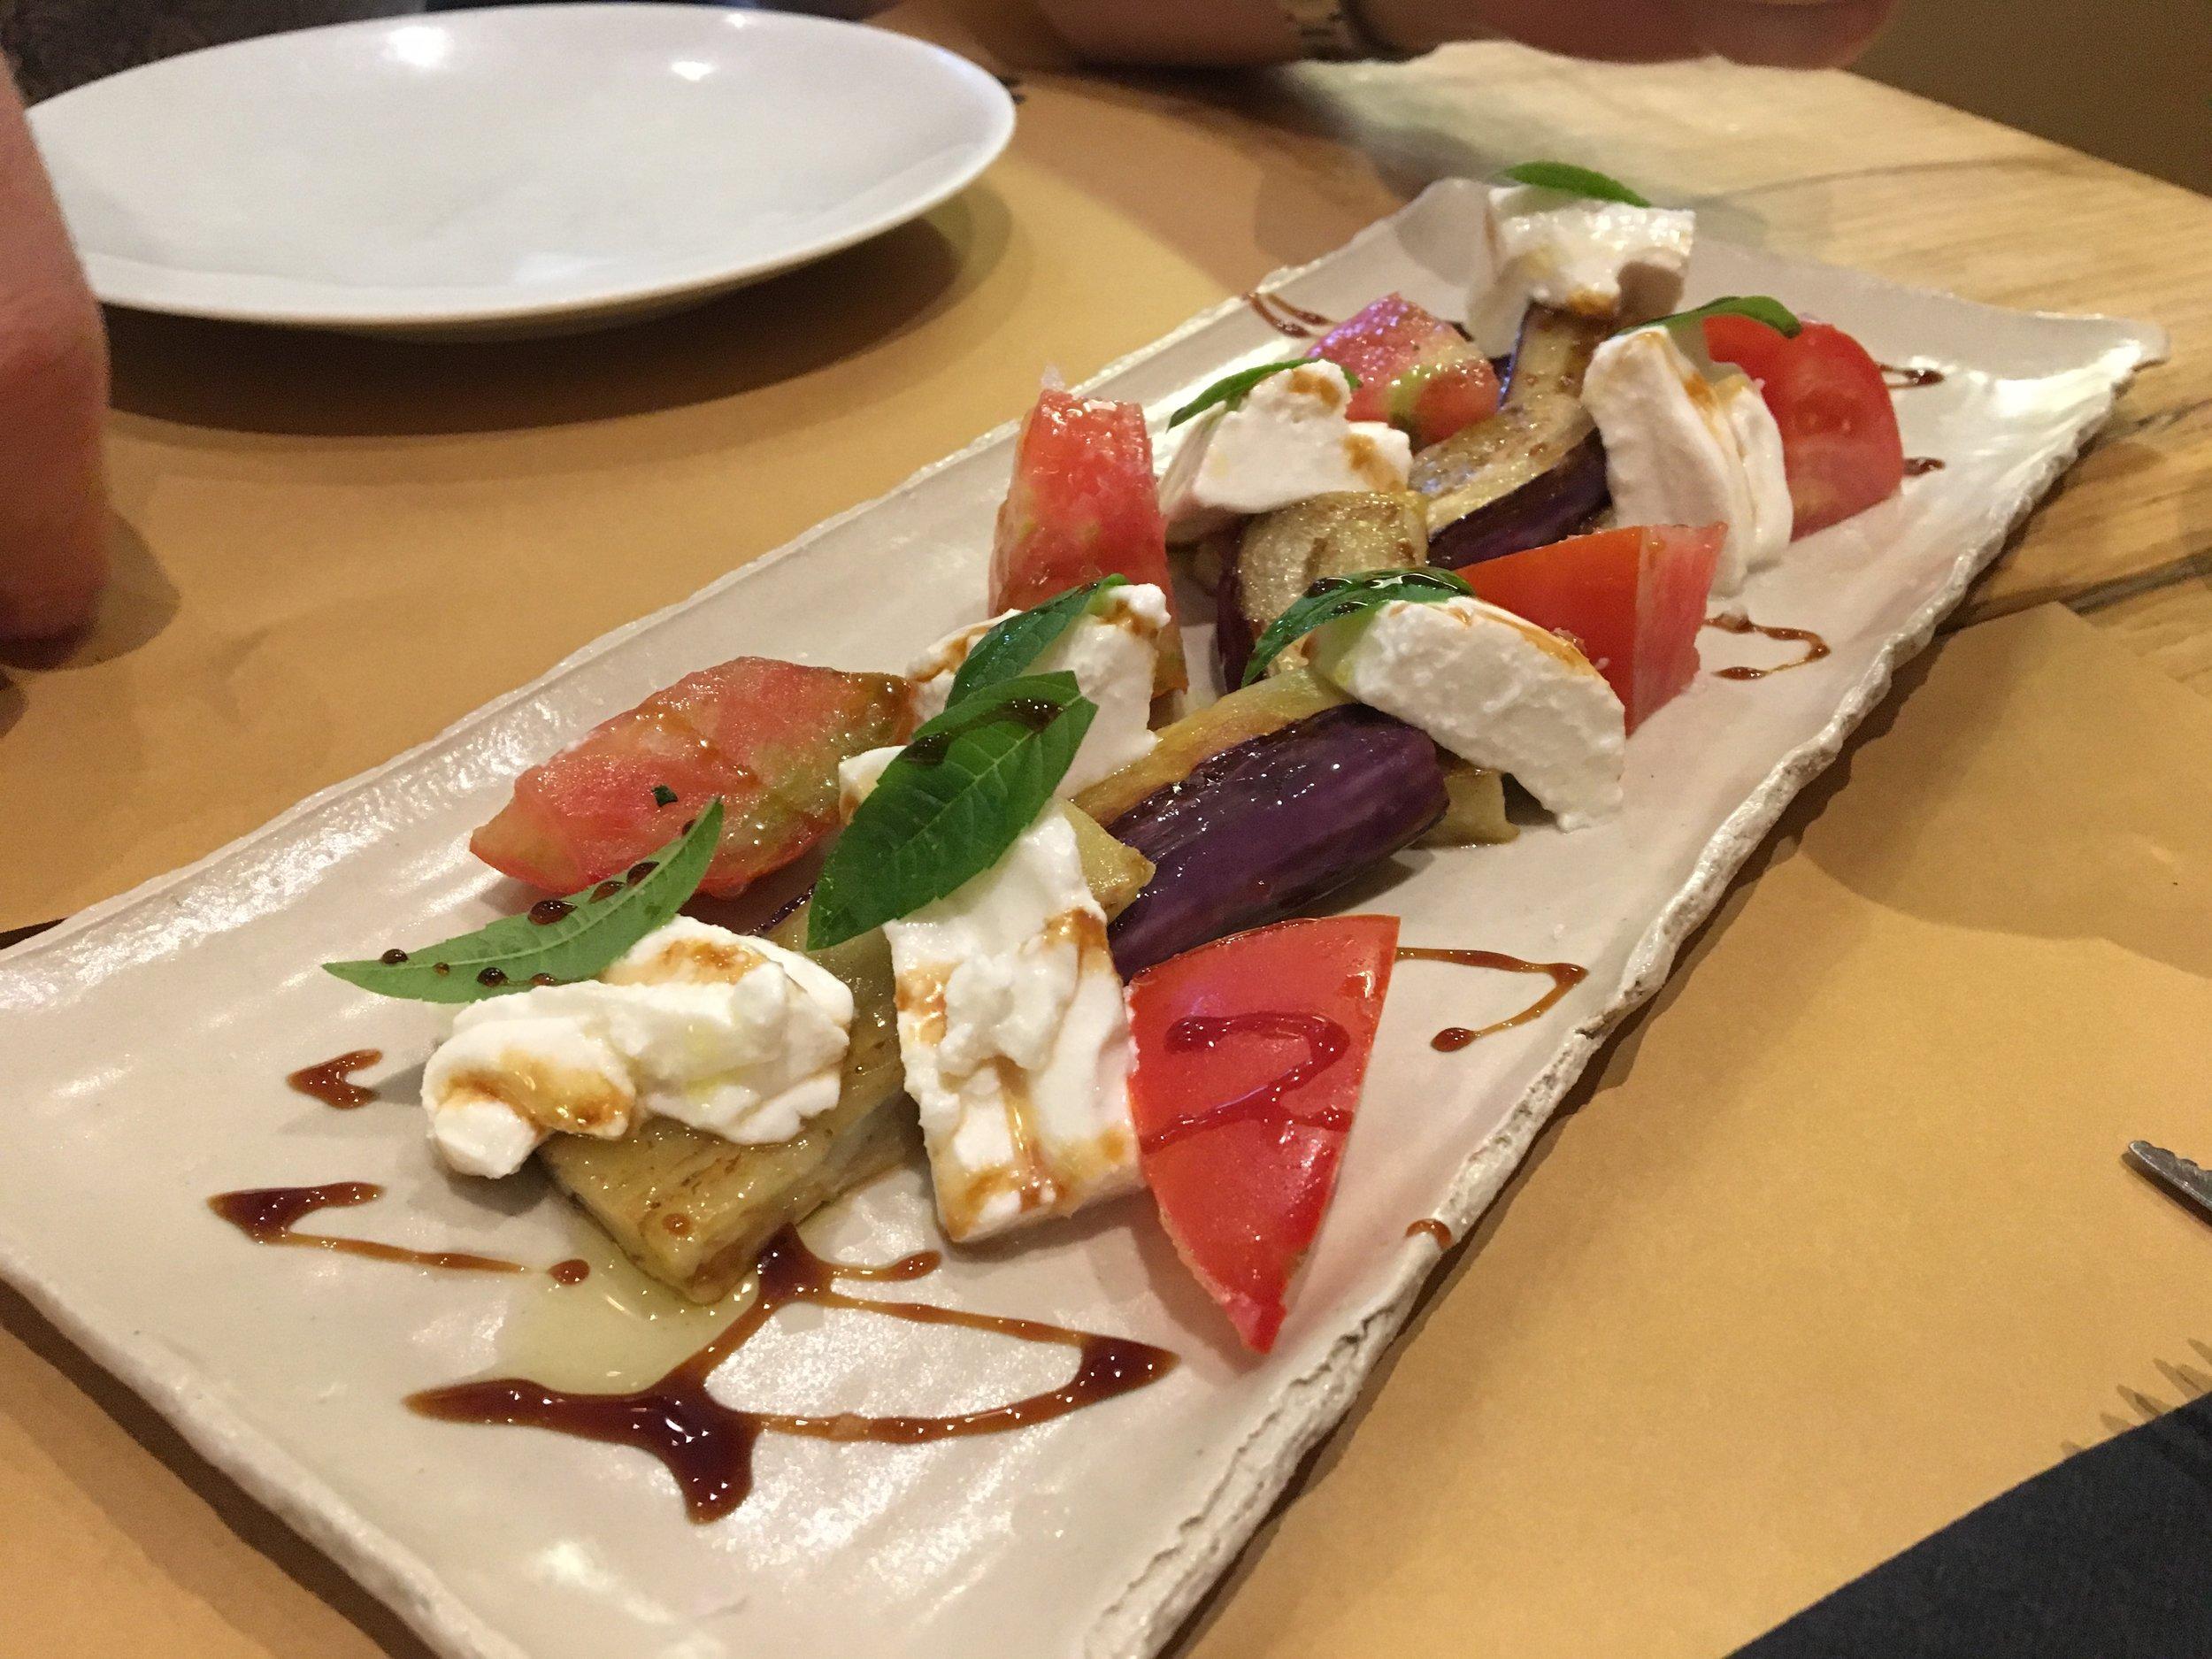 Eggplant and tomato salad at La Panxa